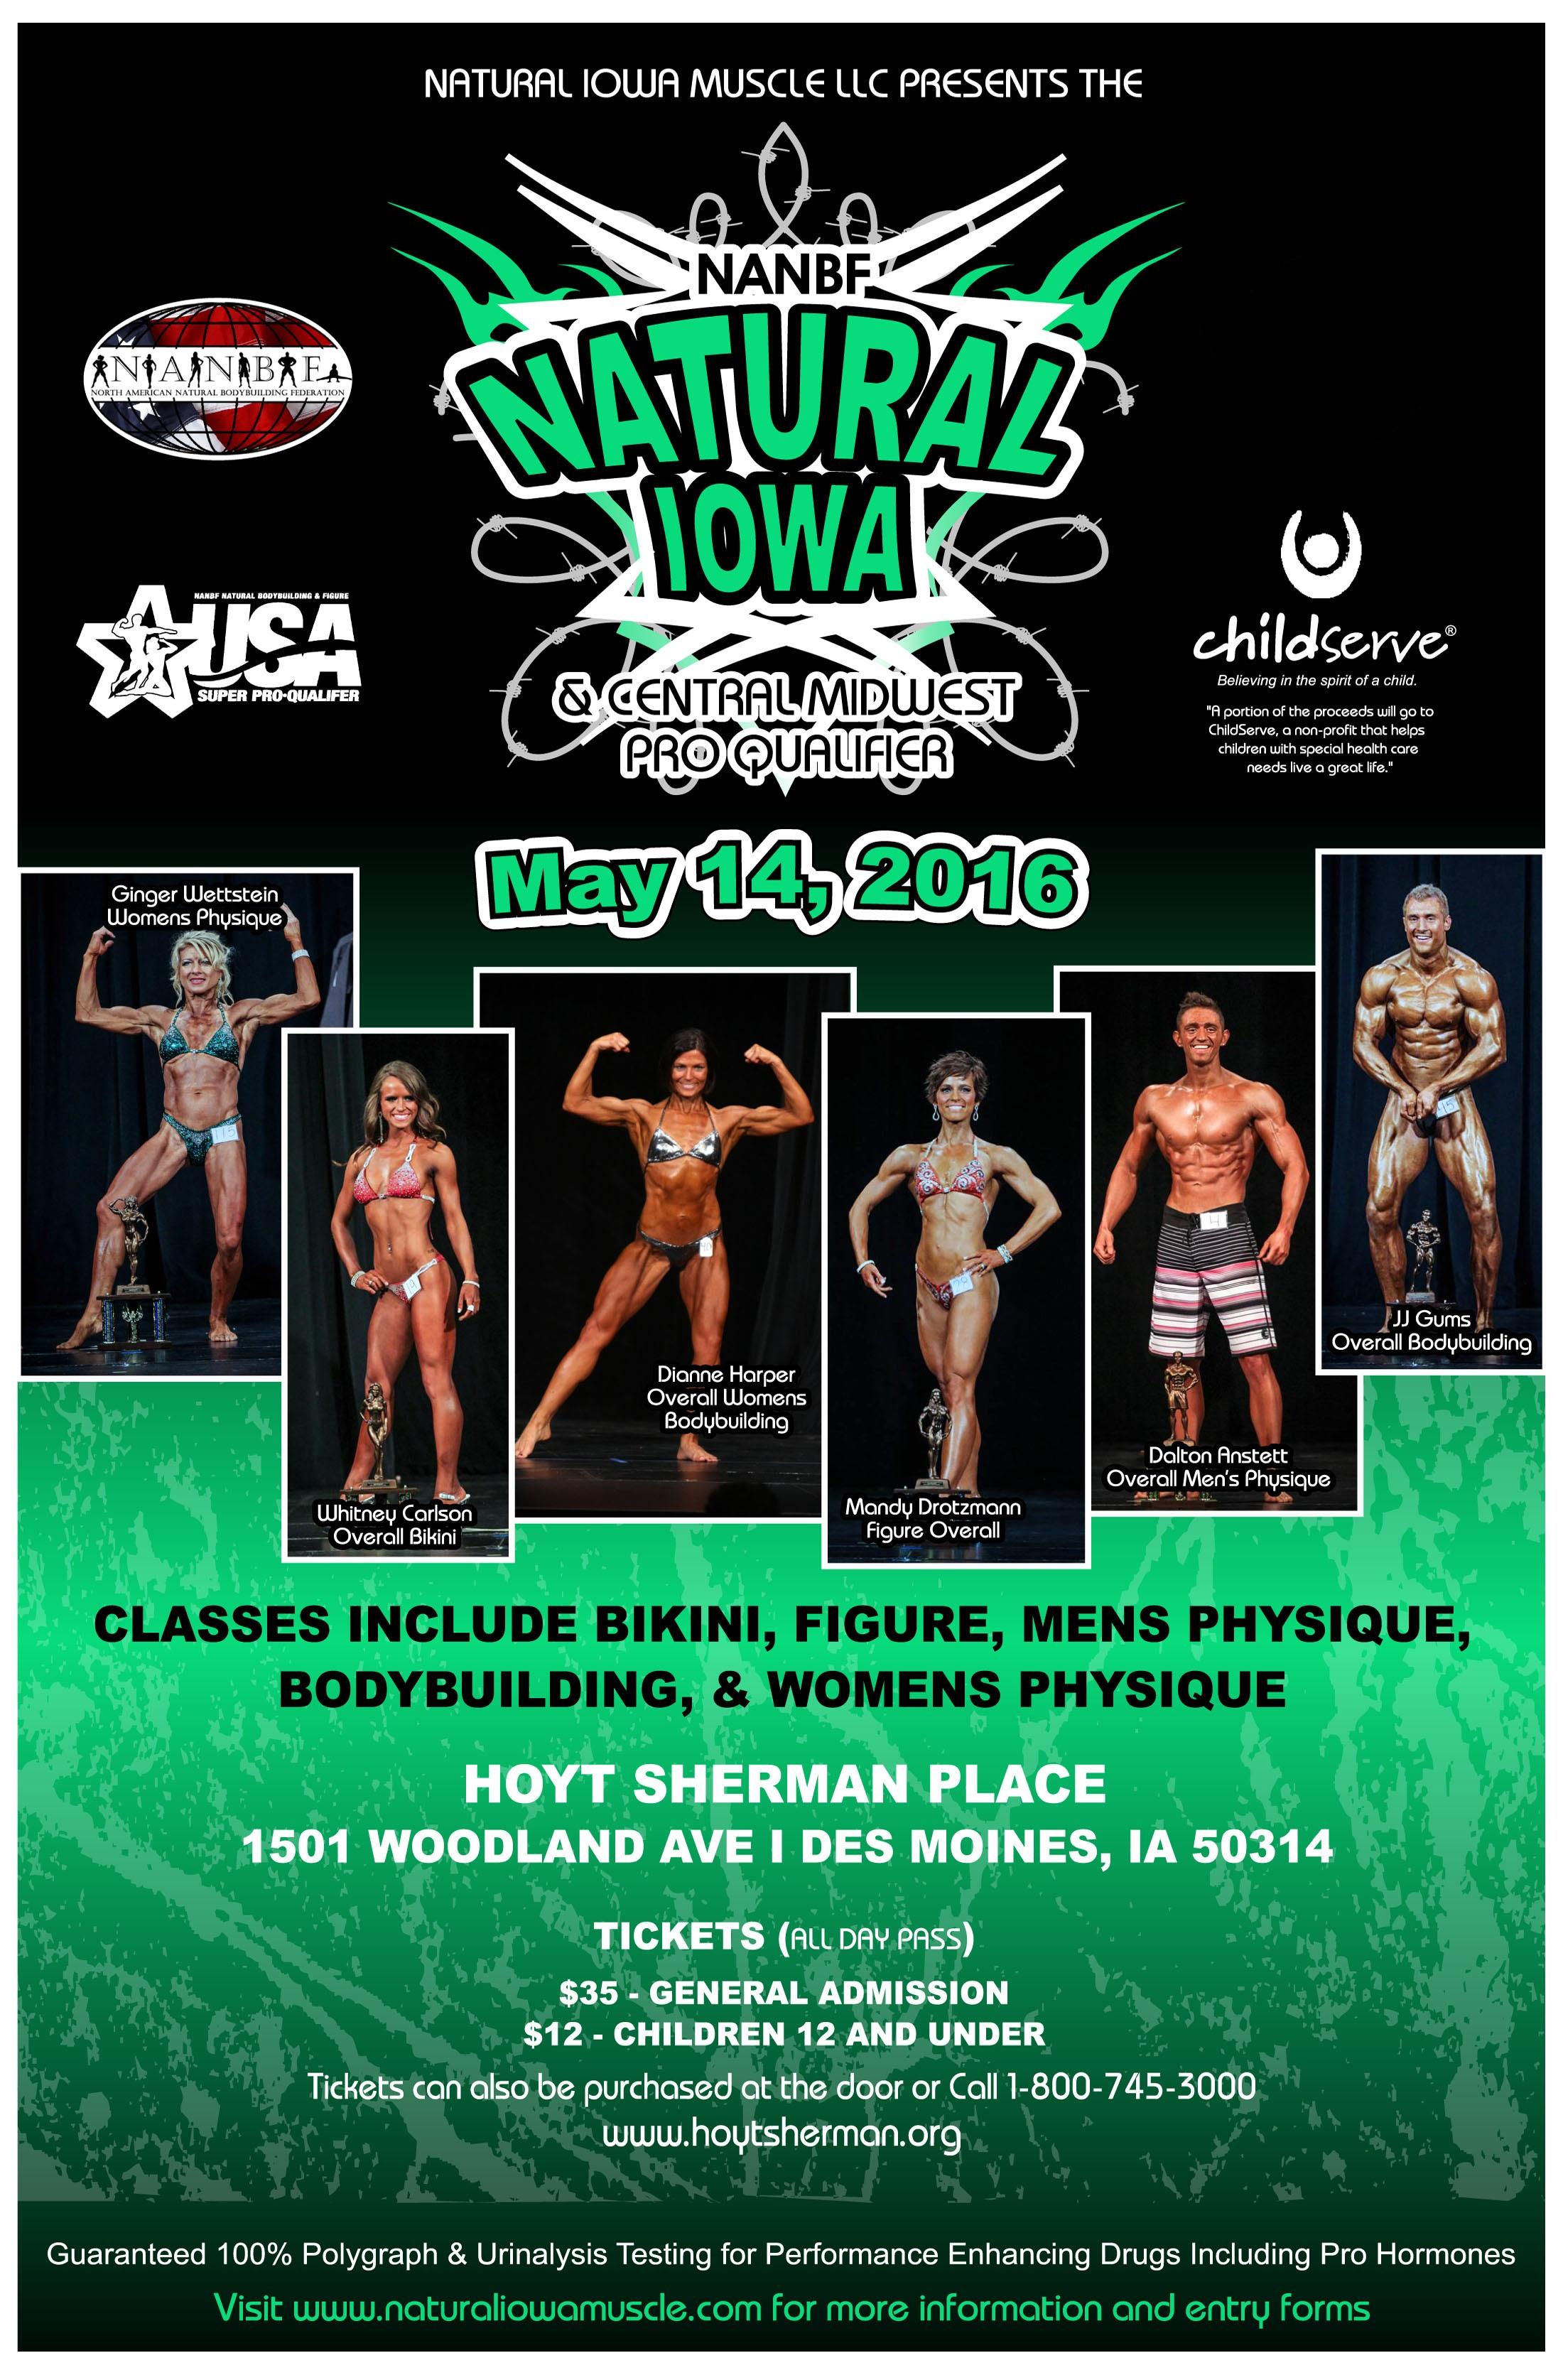 Information for the 2016 NANBF Natural Iowa!!